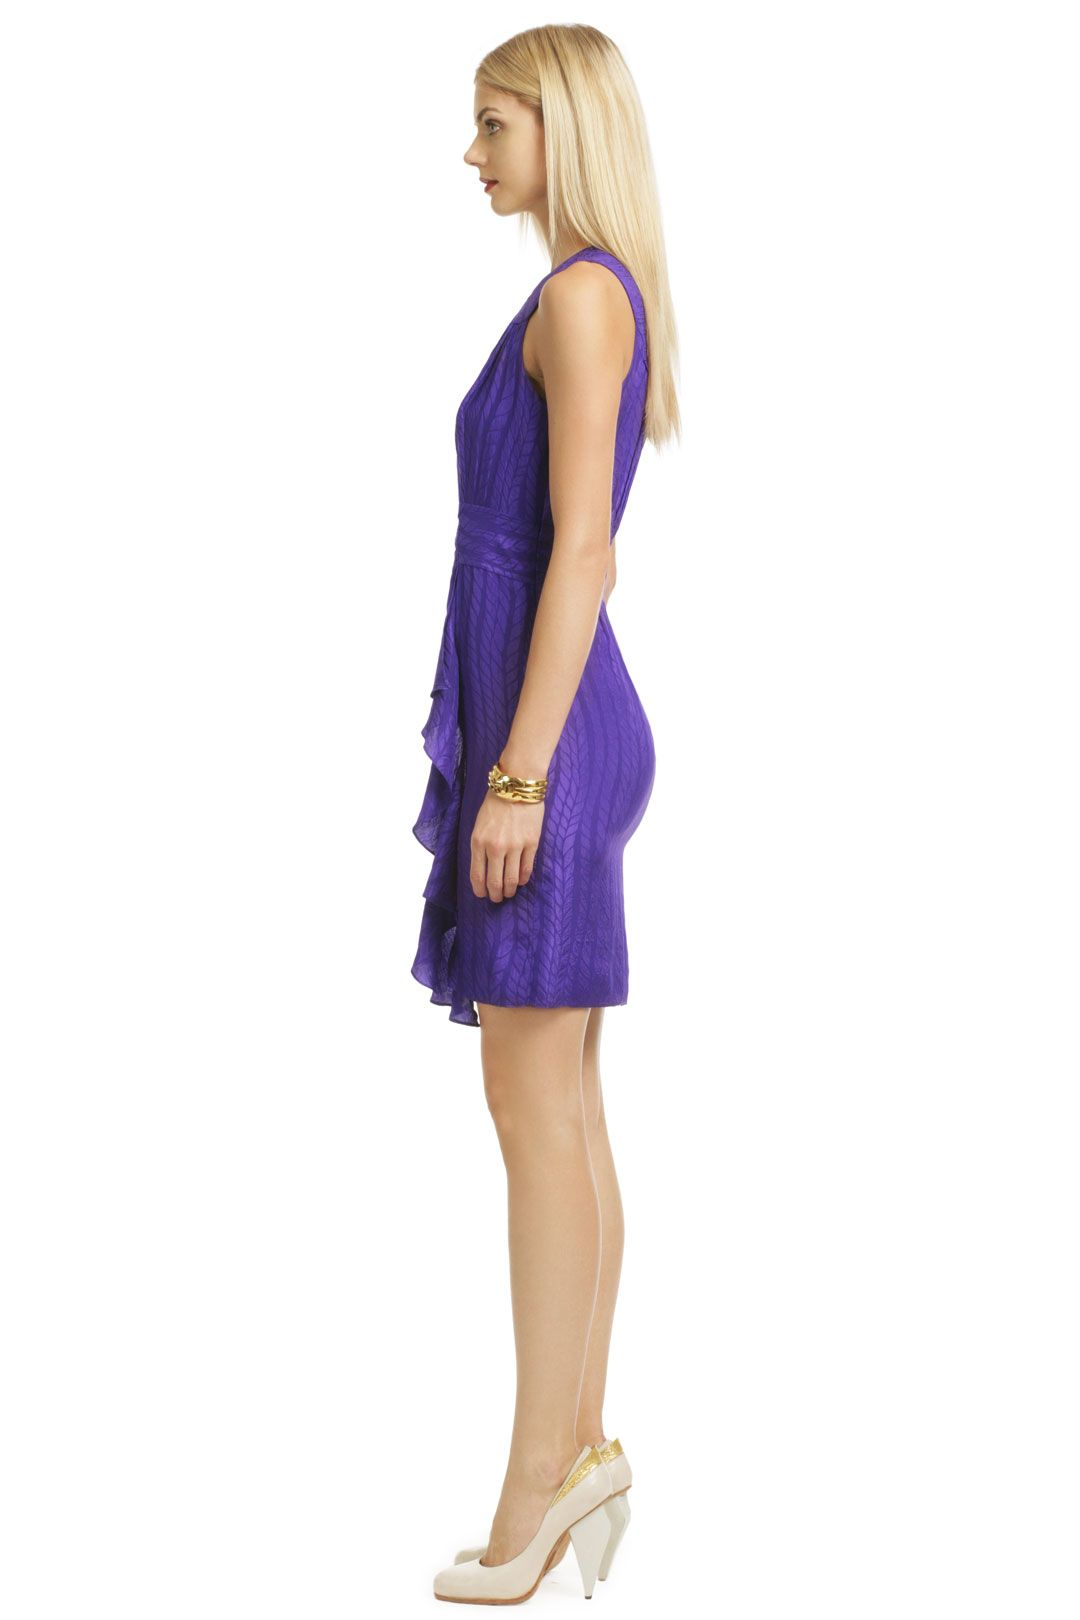 dress_milly_step_into_my_world_detail1.jpg (1080×1620)